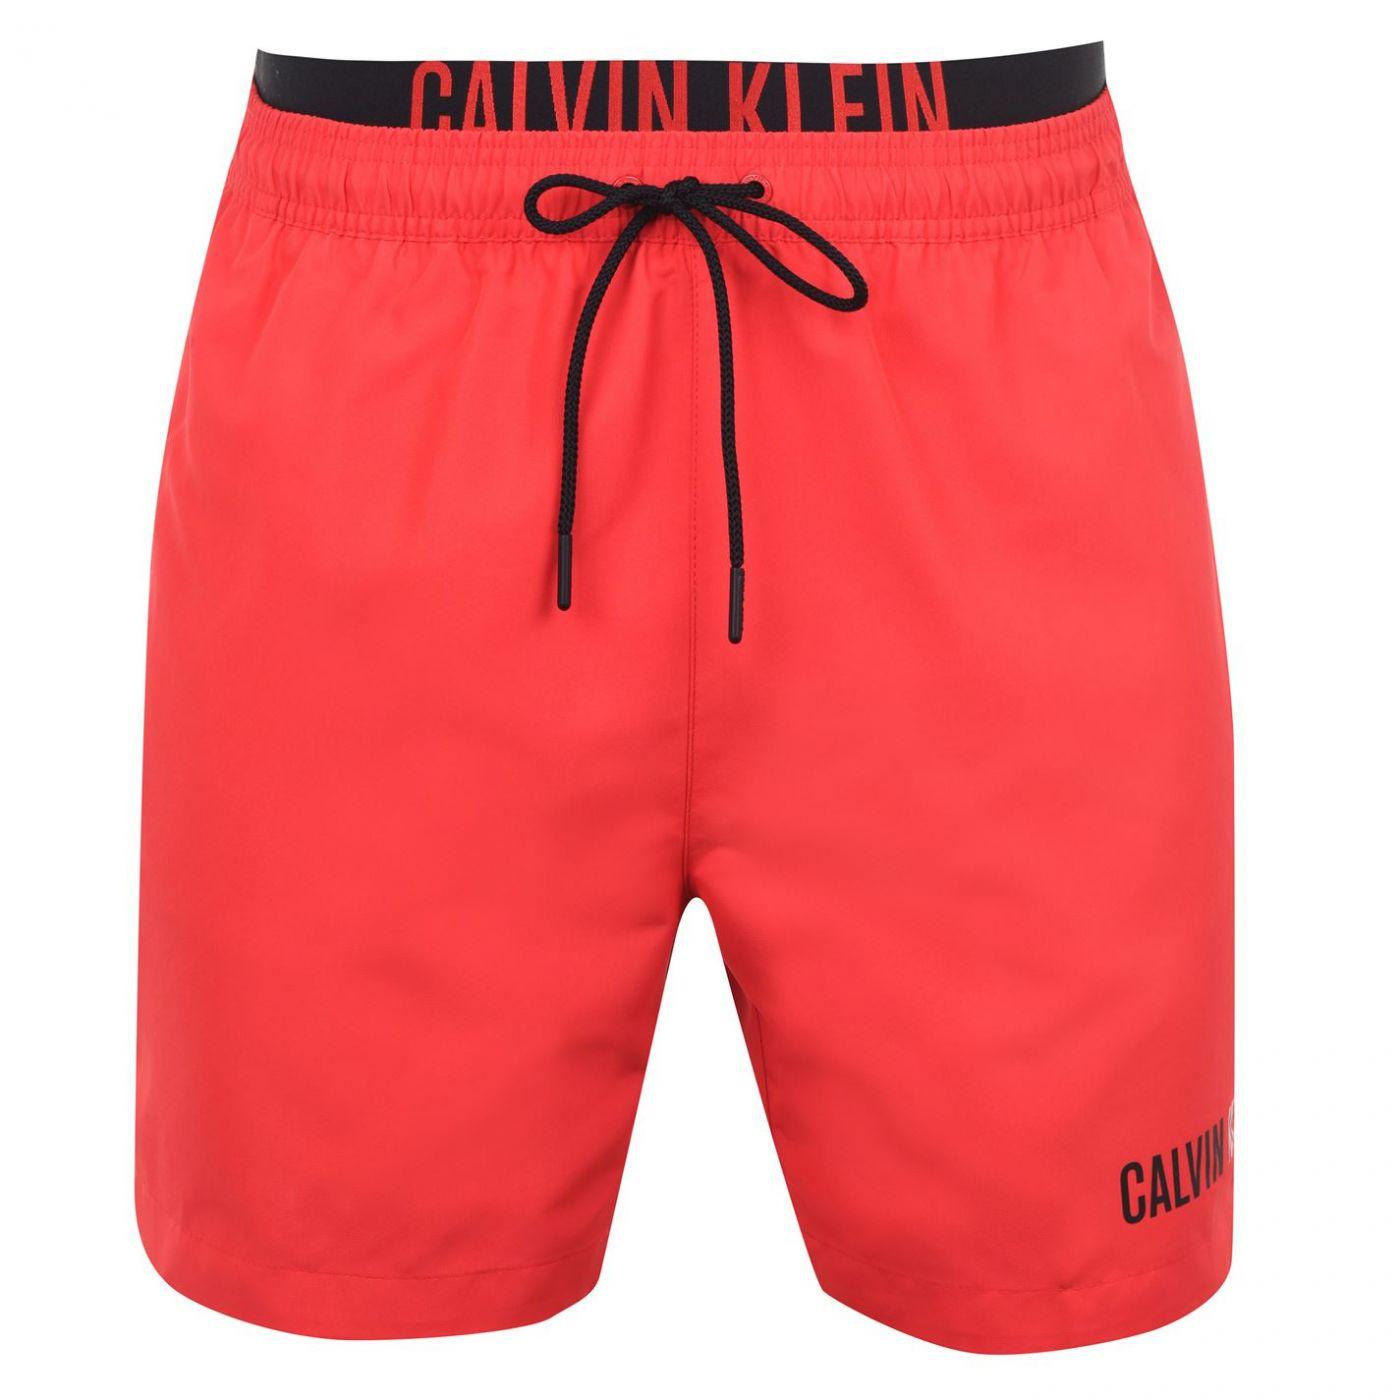 Calvin Klein Waistband Medium Swim Shorts